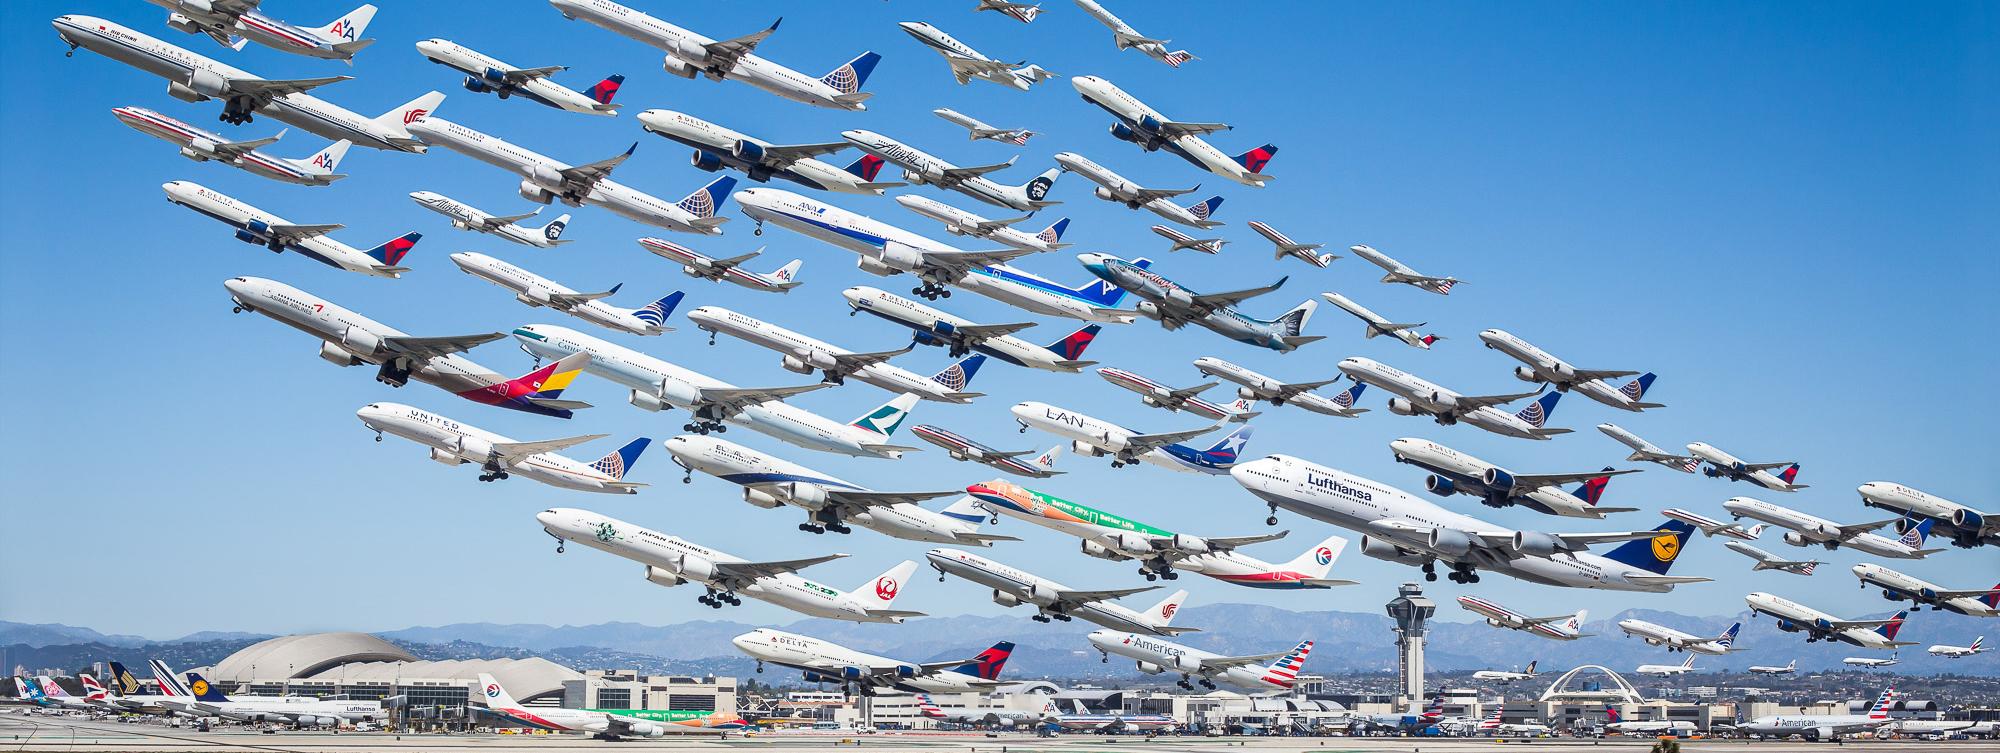 Predicting Airline Delays: Part 1